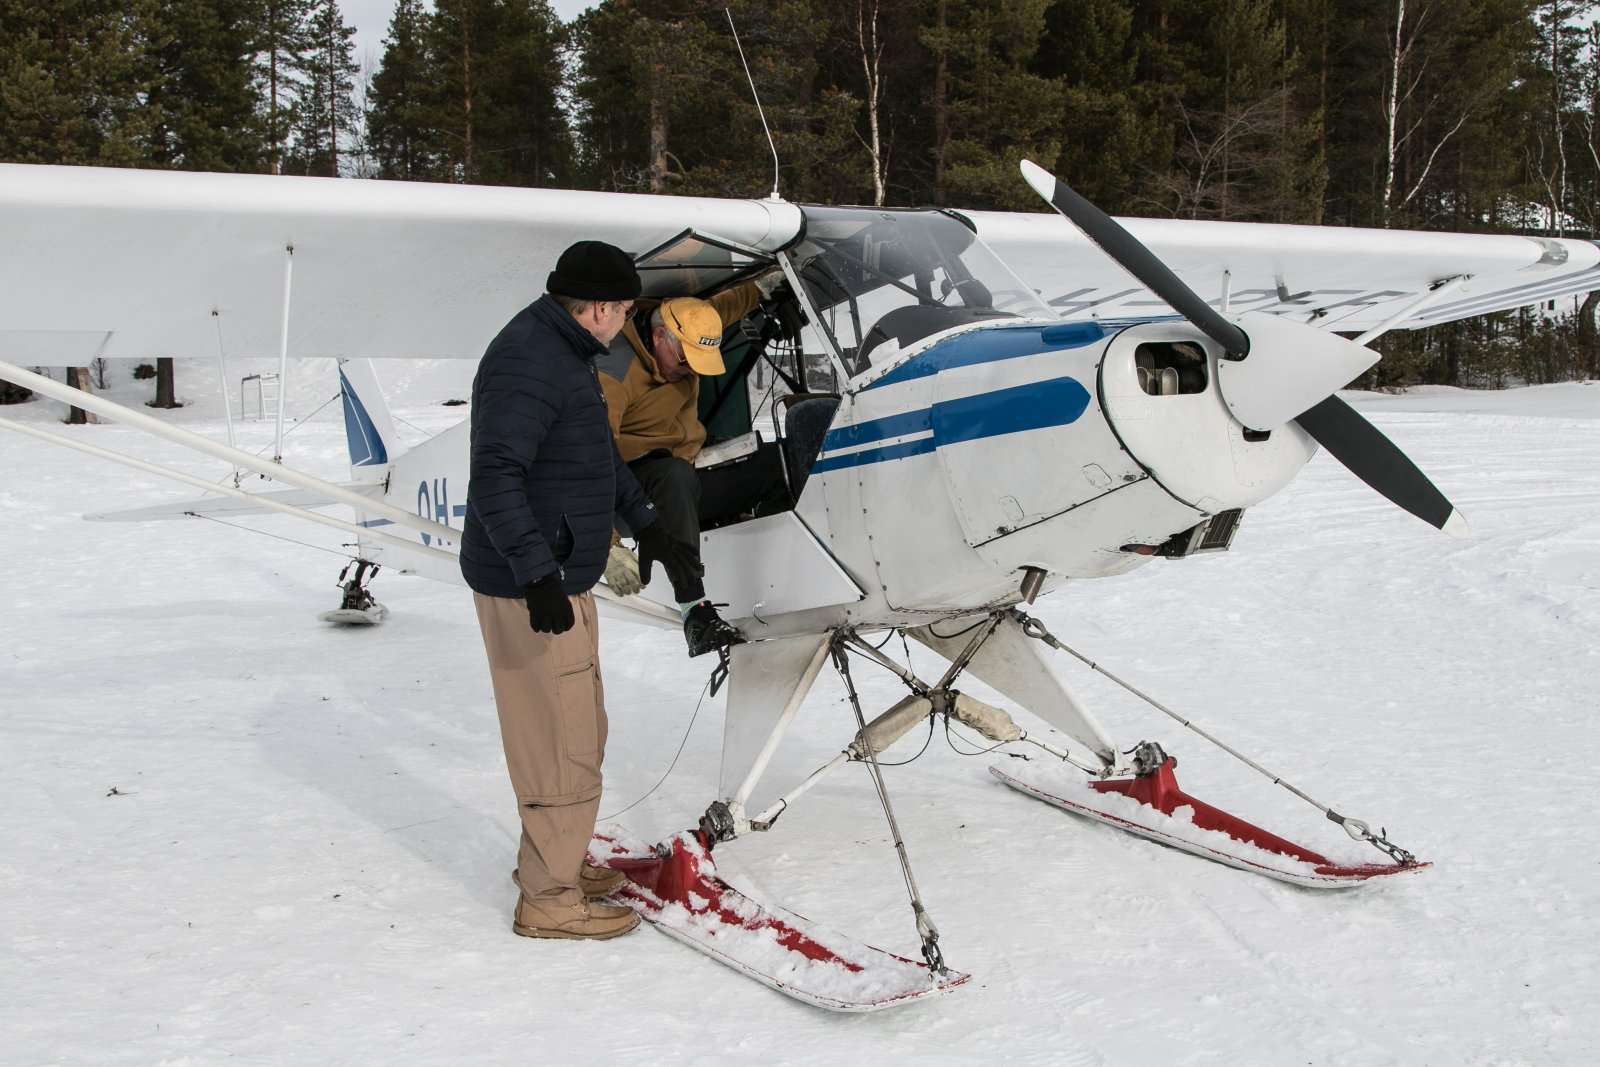 OH-PEP 2.4.2019. Vk 14 Suksilentoleiri Ivalossa.